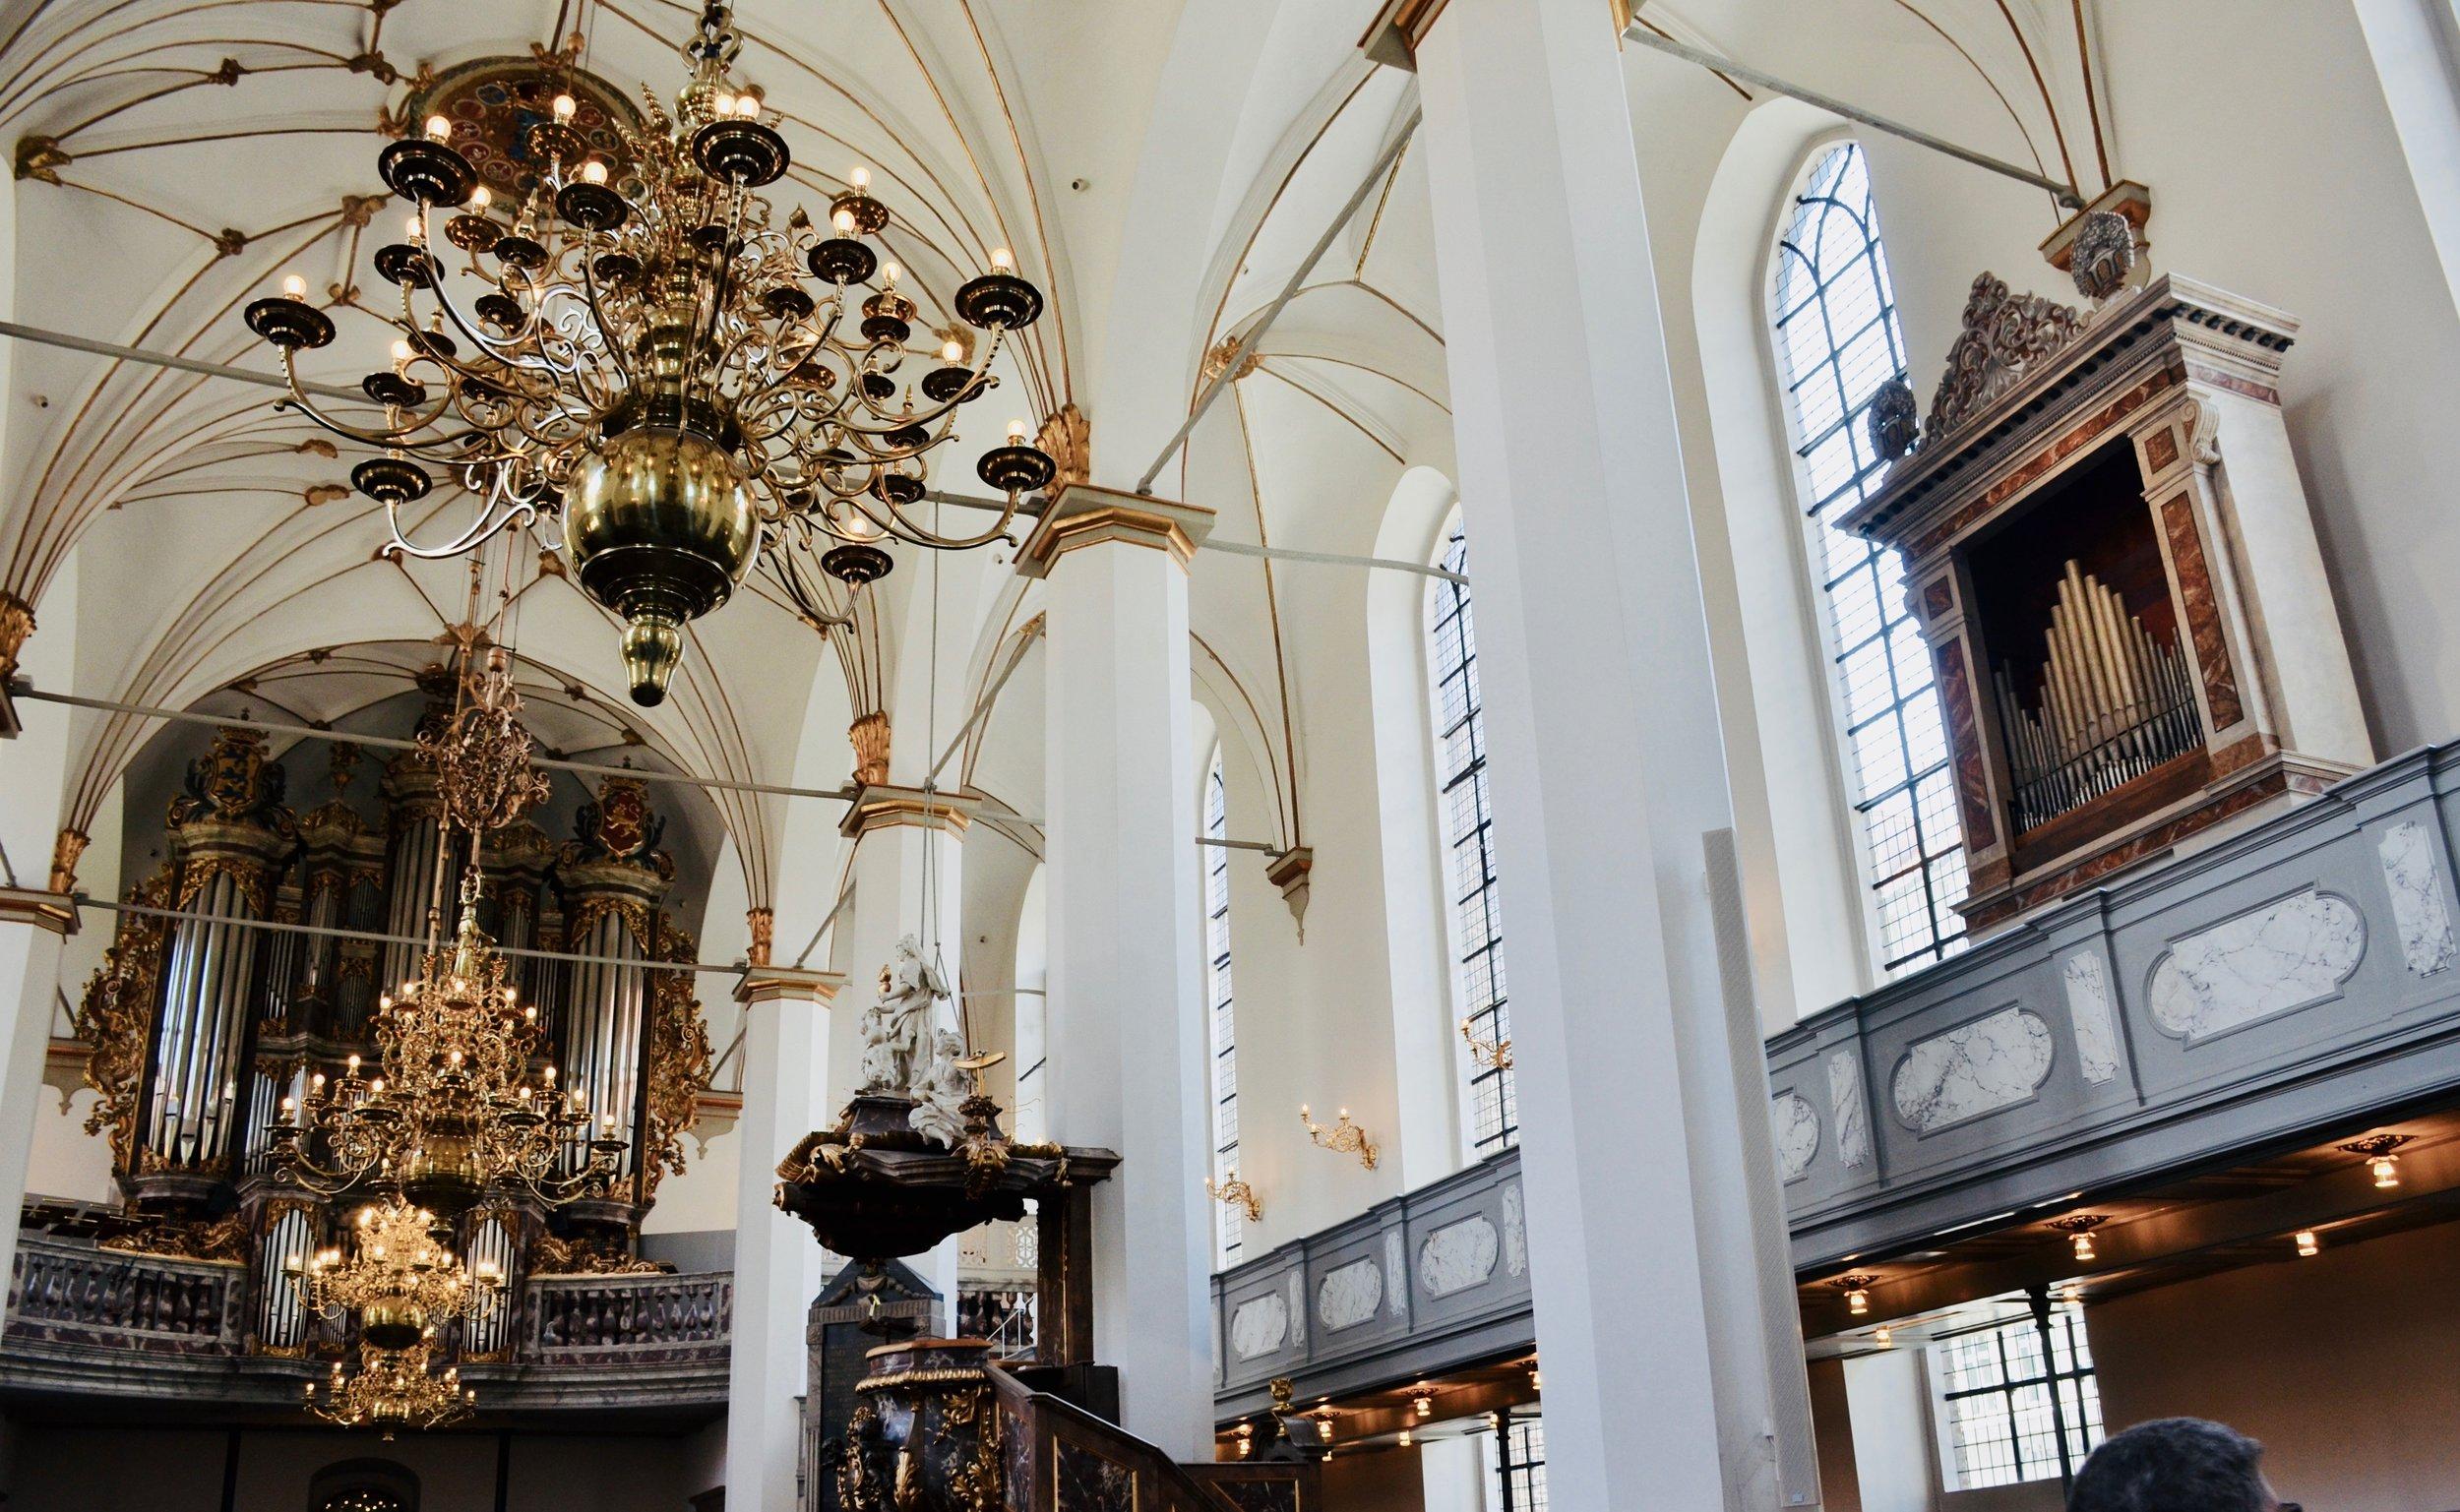 The organs of Trinitatis Kirke, Copenhagen.